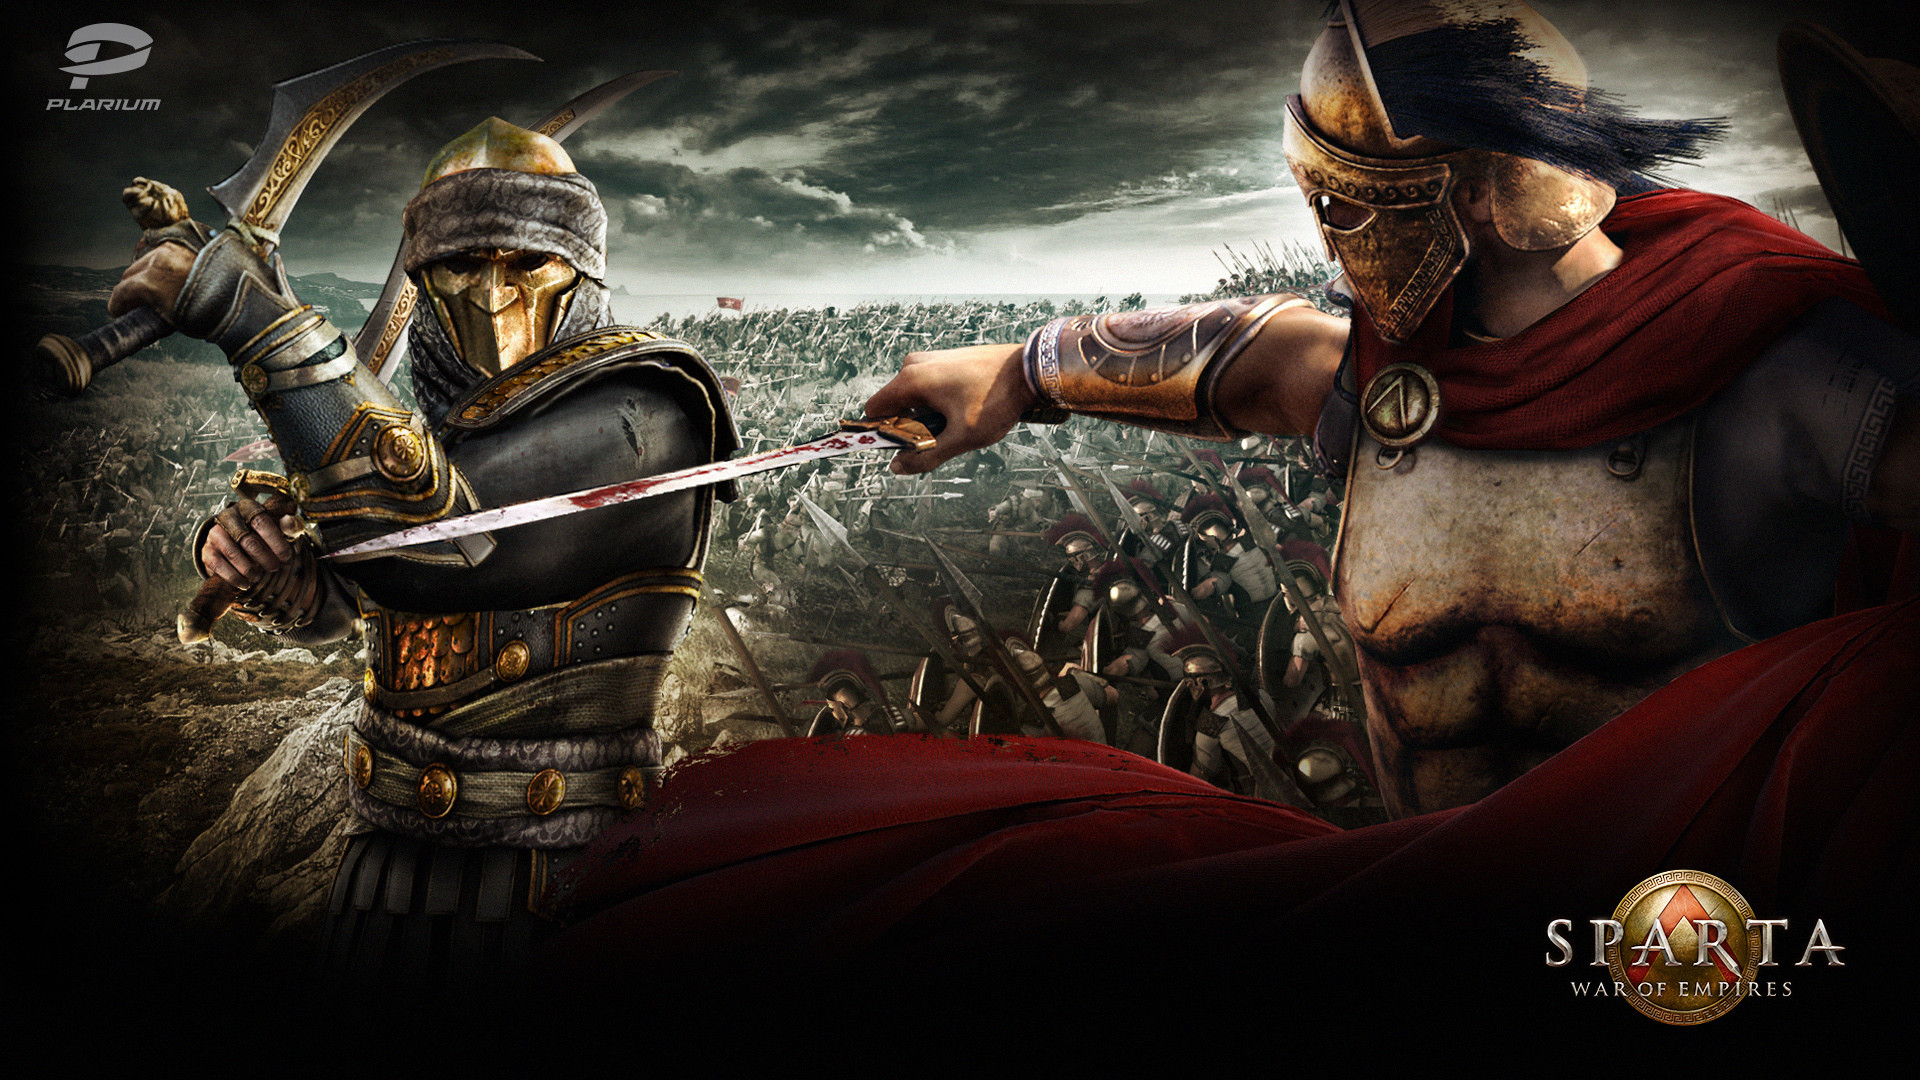 Best Collection of Battle Digital Art Wallpapers. | guidesigner